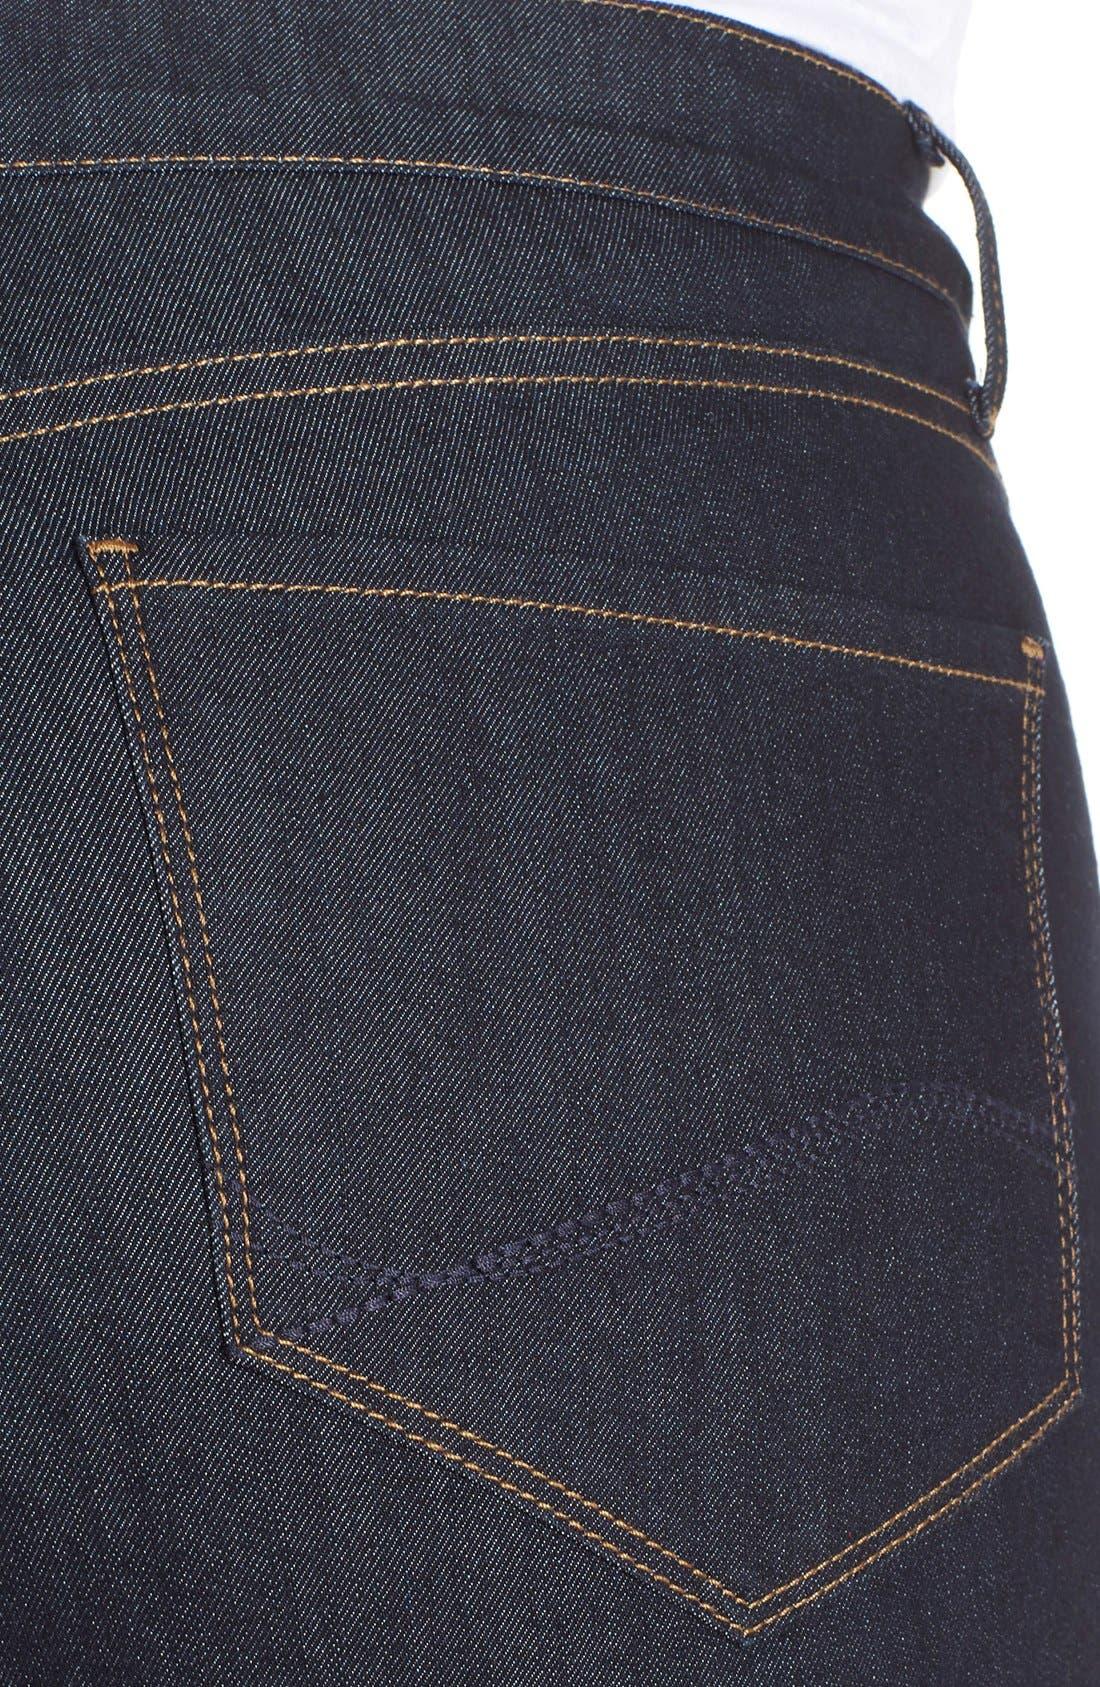 Alternate Image 4  - NYDJ 'Briella' Stretch Roll Cuff Denim Shorts (Dark) (Plus Size)